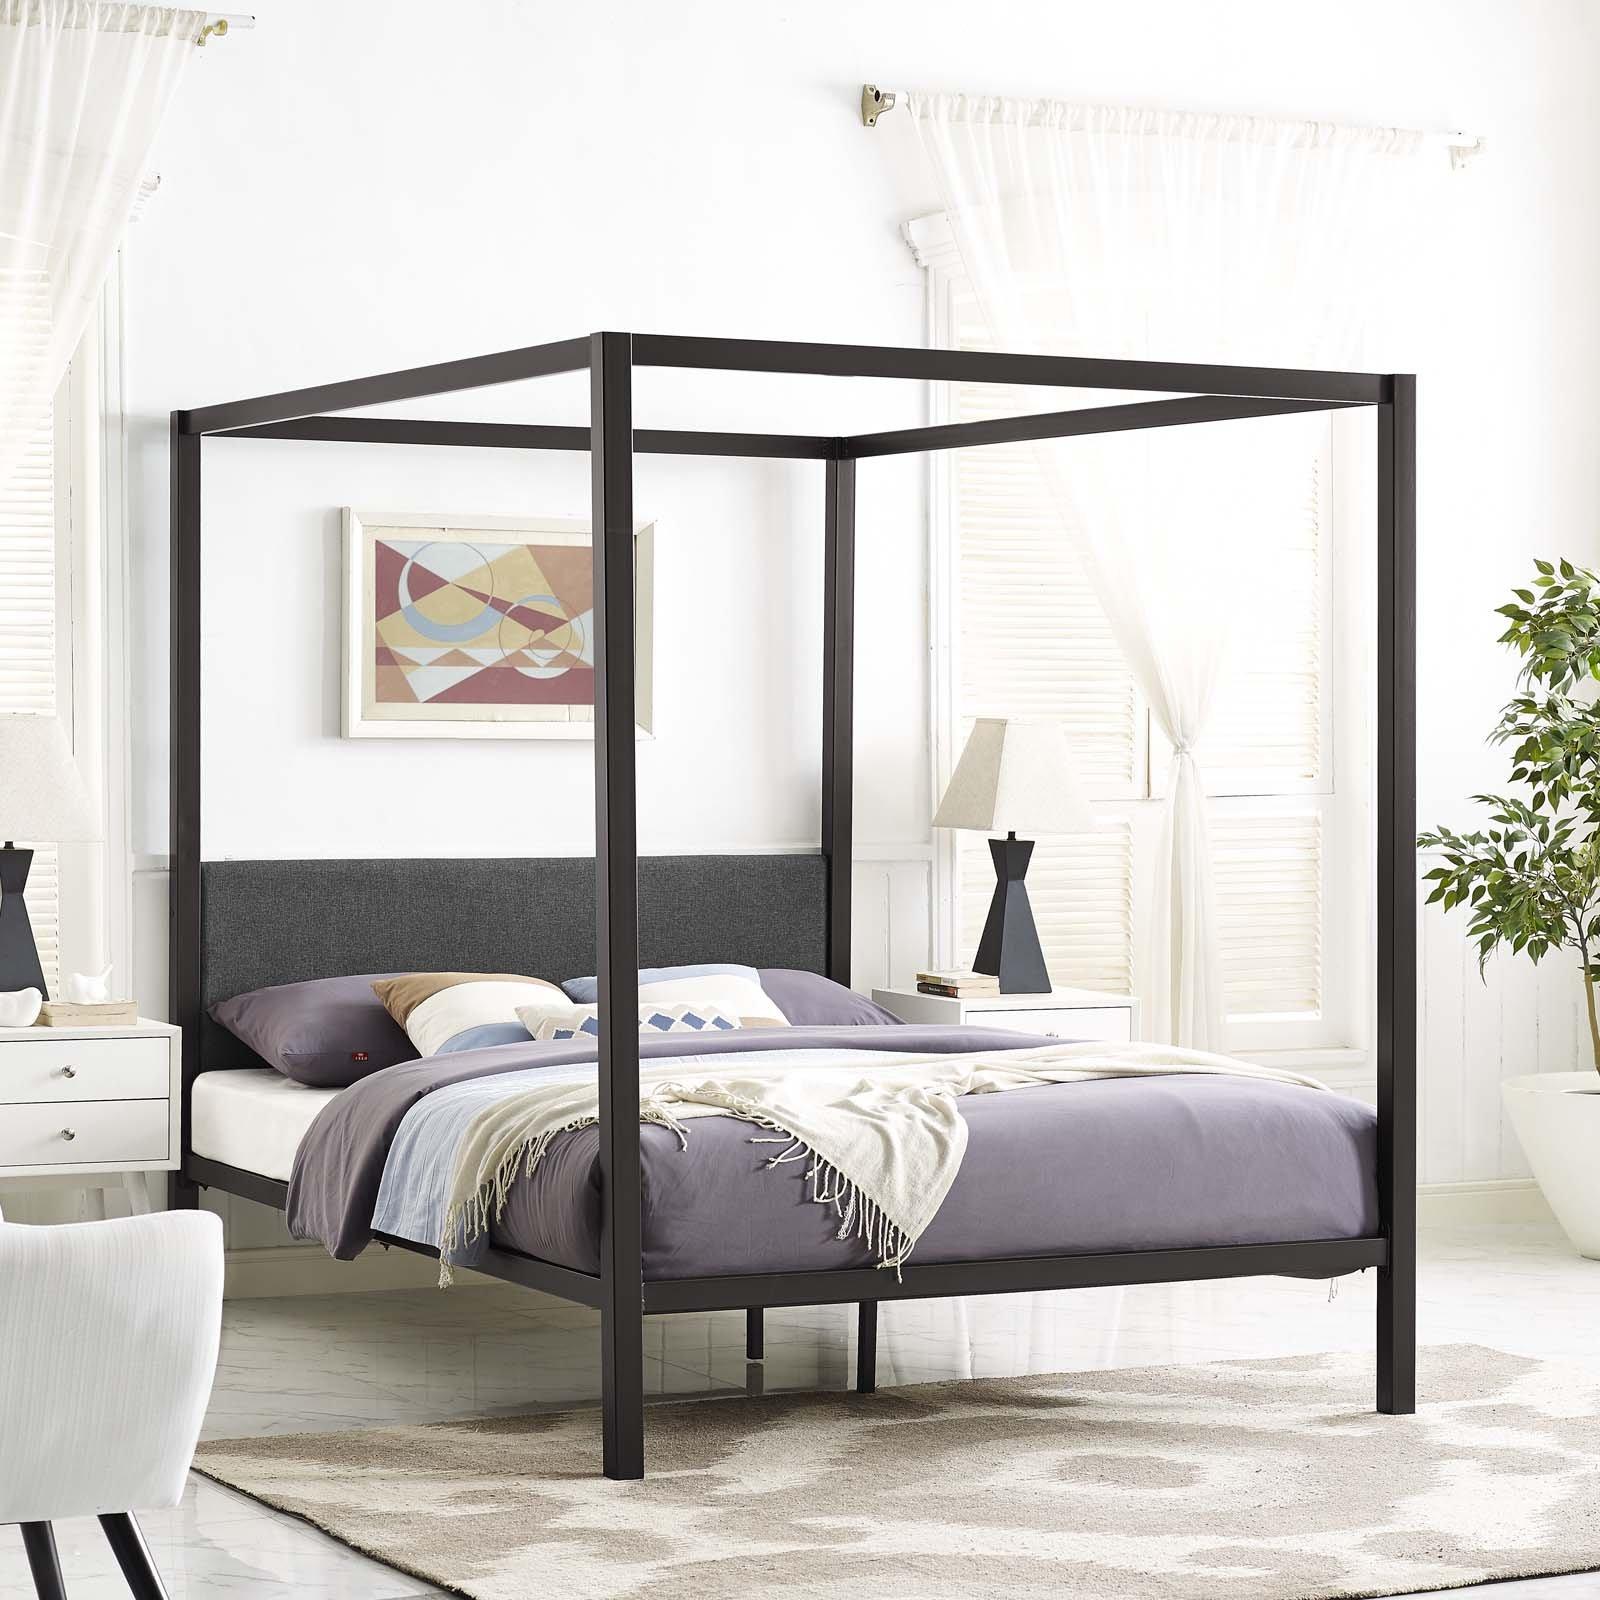 - Modway Furniture Modern Raina Queen Canopy Bed Frame - MOD-5570